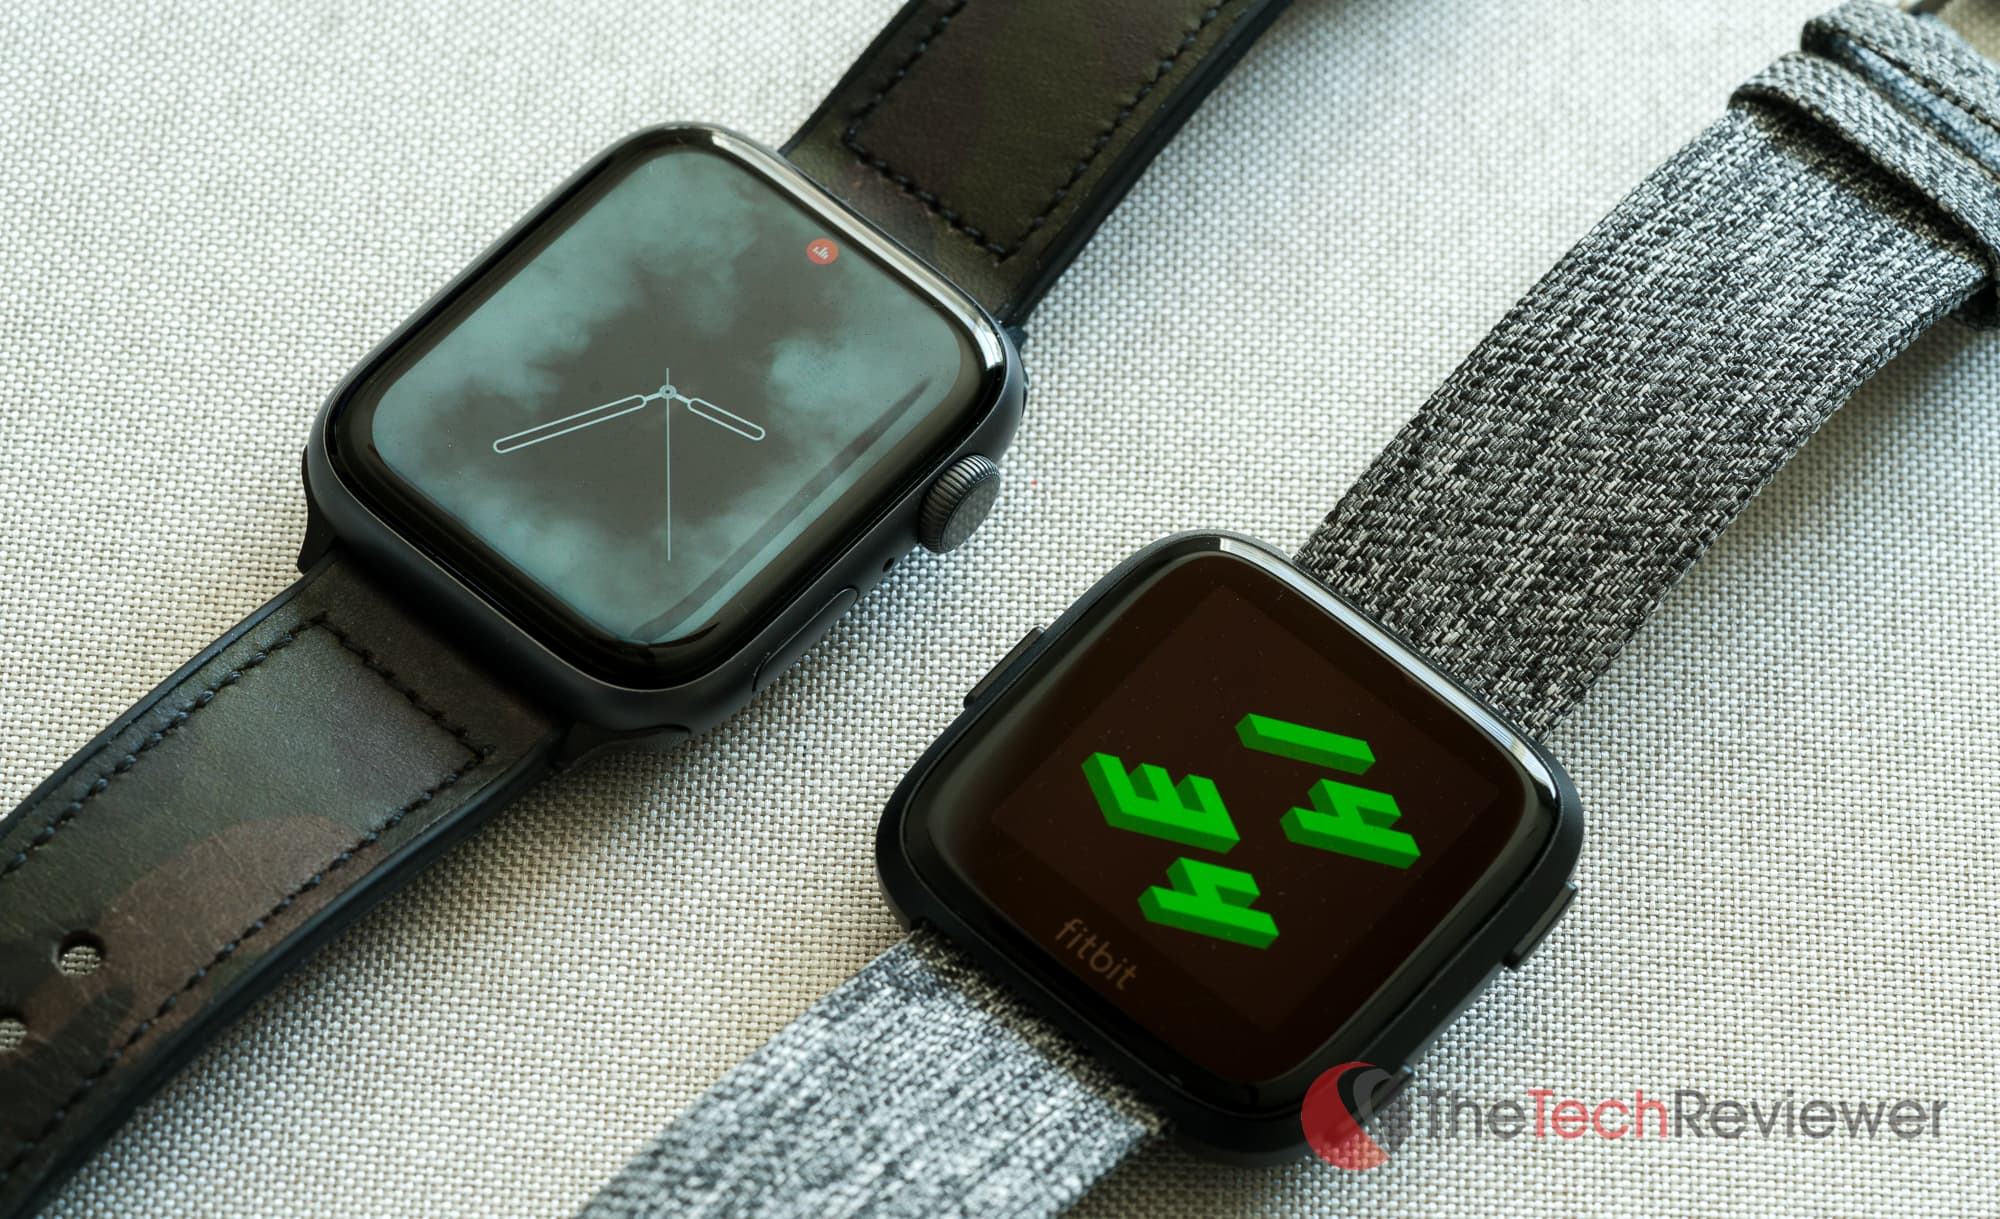 Versa vs Apple Watch Customization